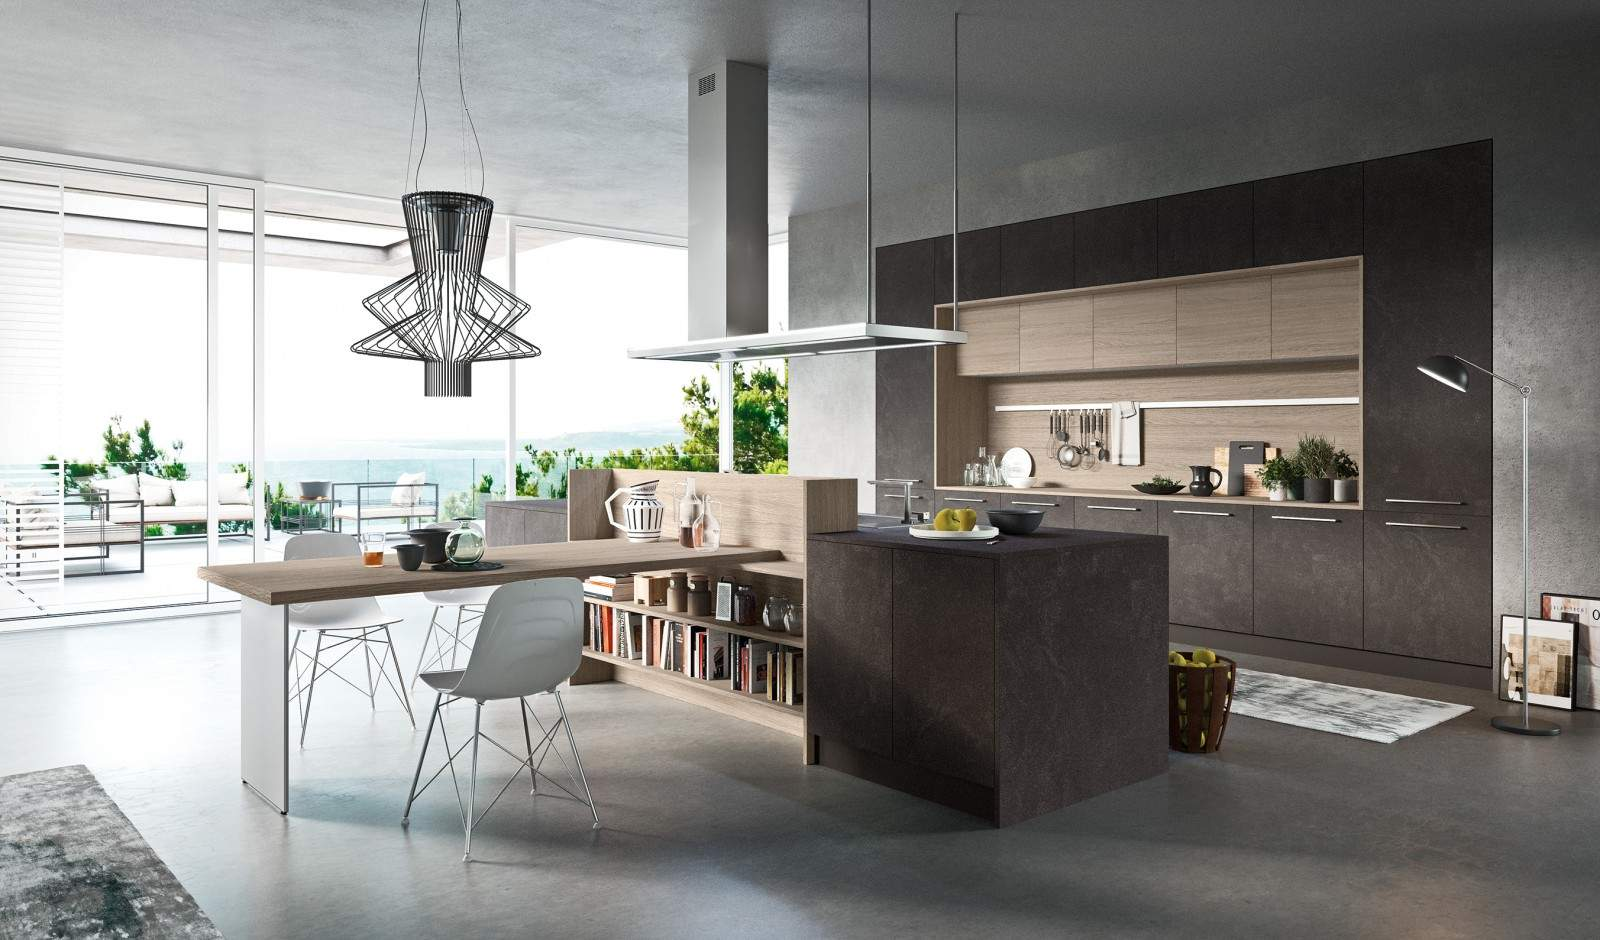 Cucine Ar Tre Arredamenti Buzzanca - Cucine Ar Tre Opinioni ...